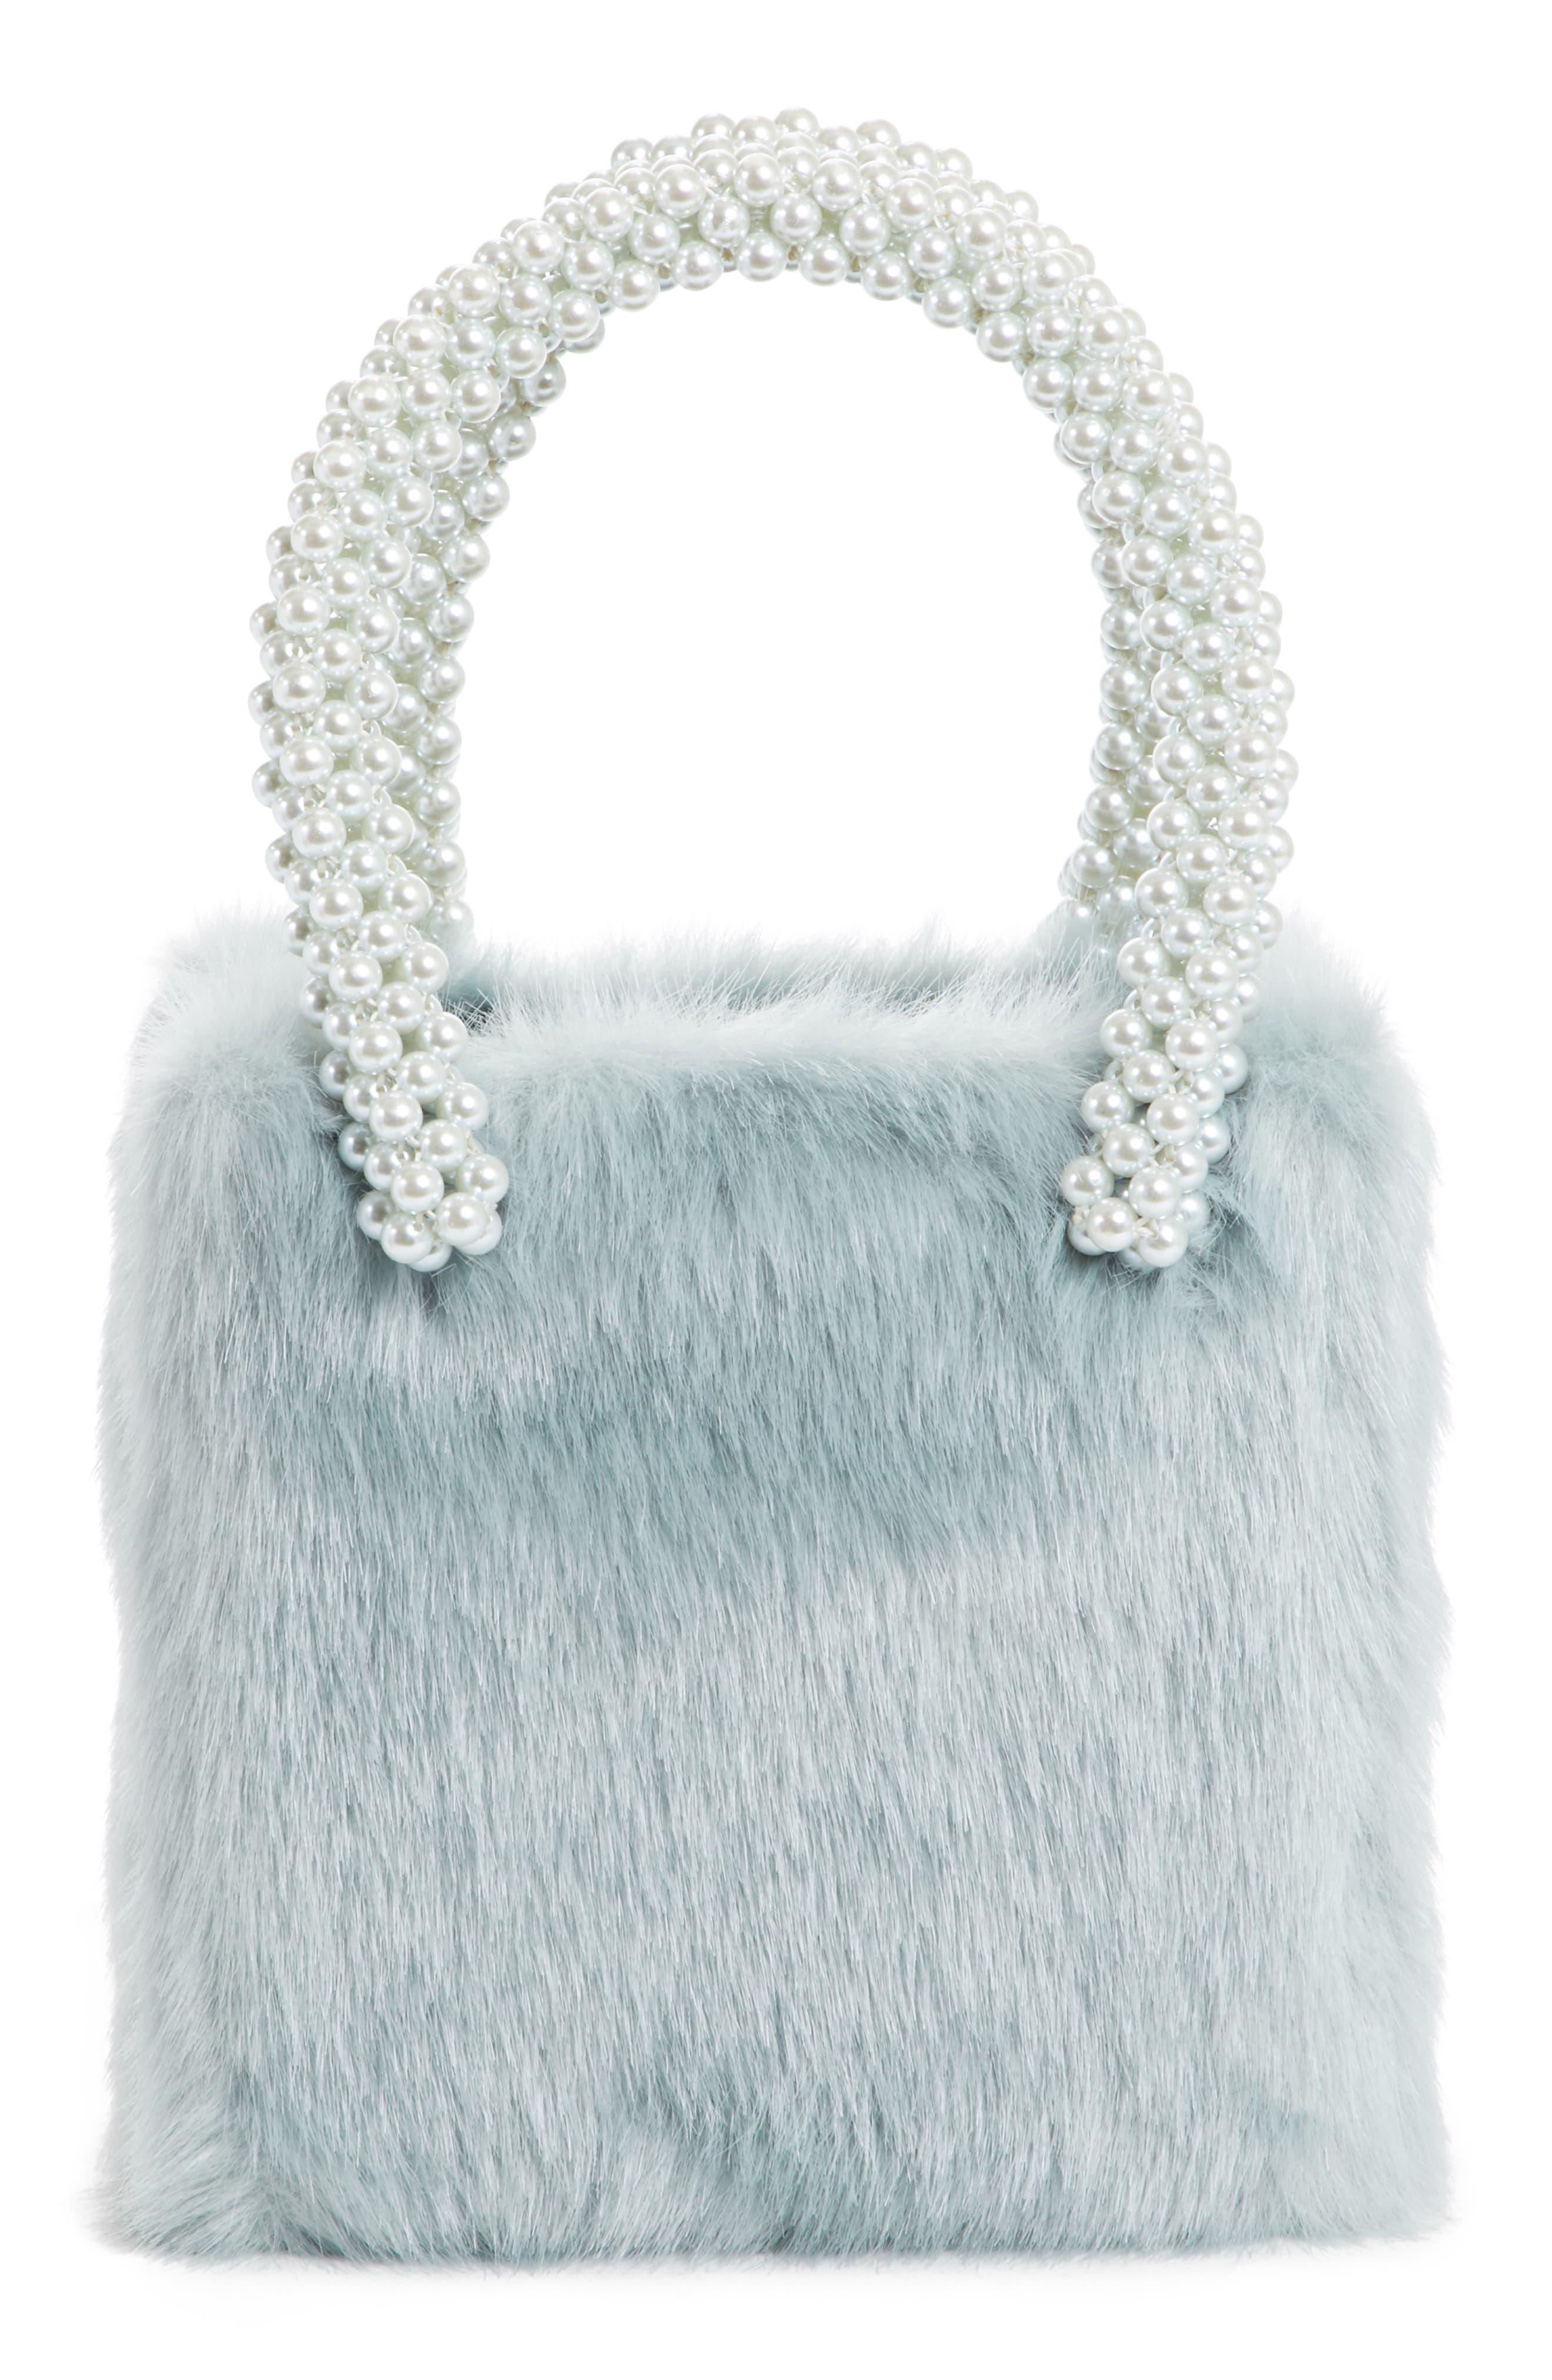 Shrimps Una Check Faux Fur Bag with Imitation Pearl Handles